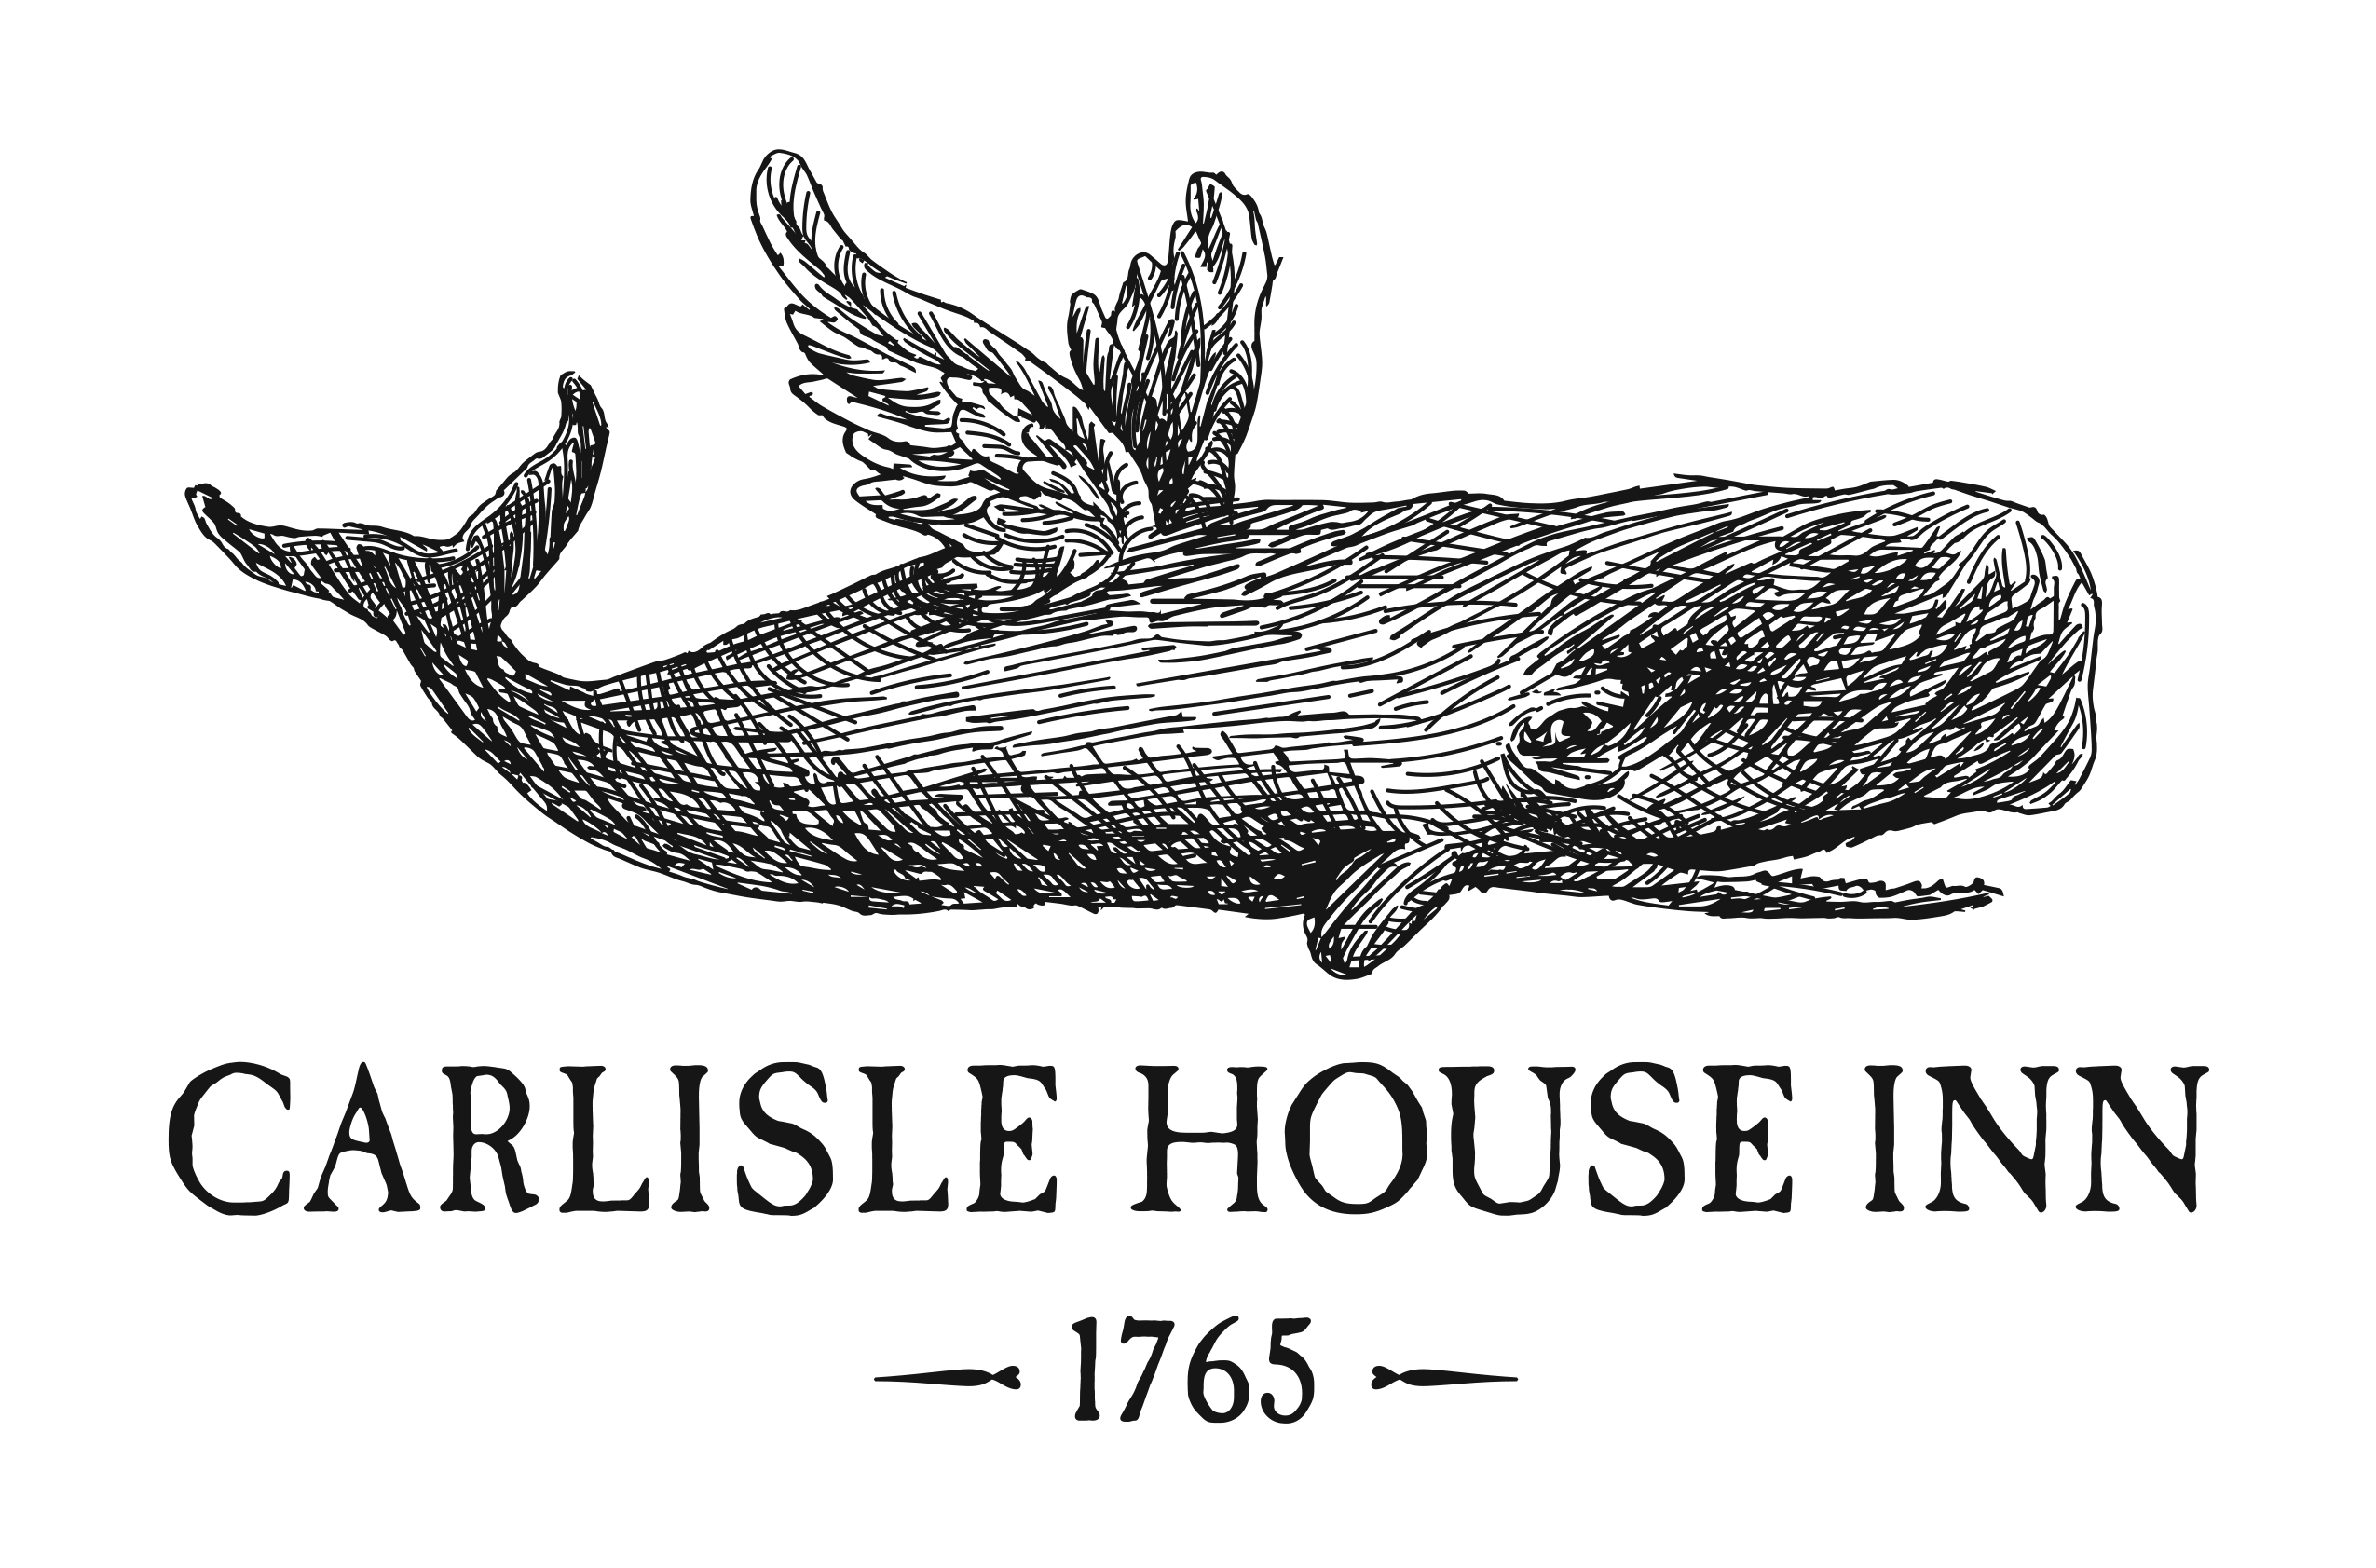 Carlisle House logo